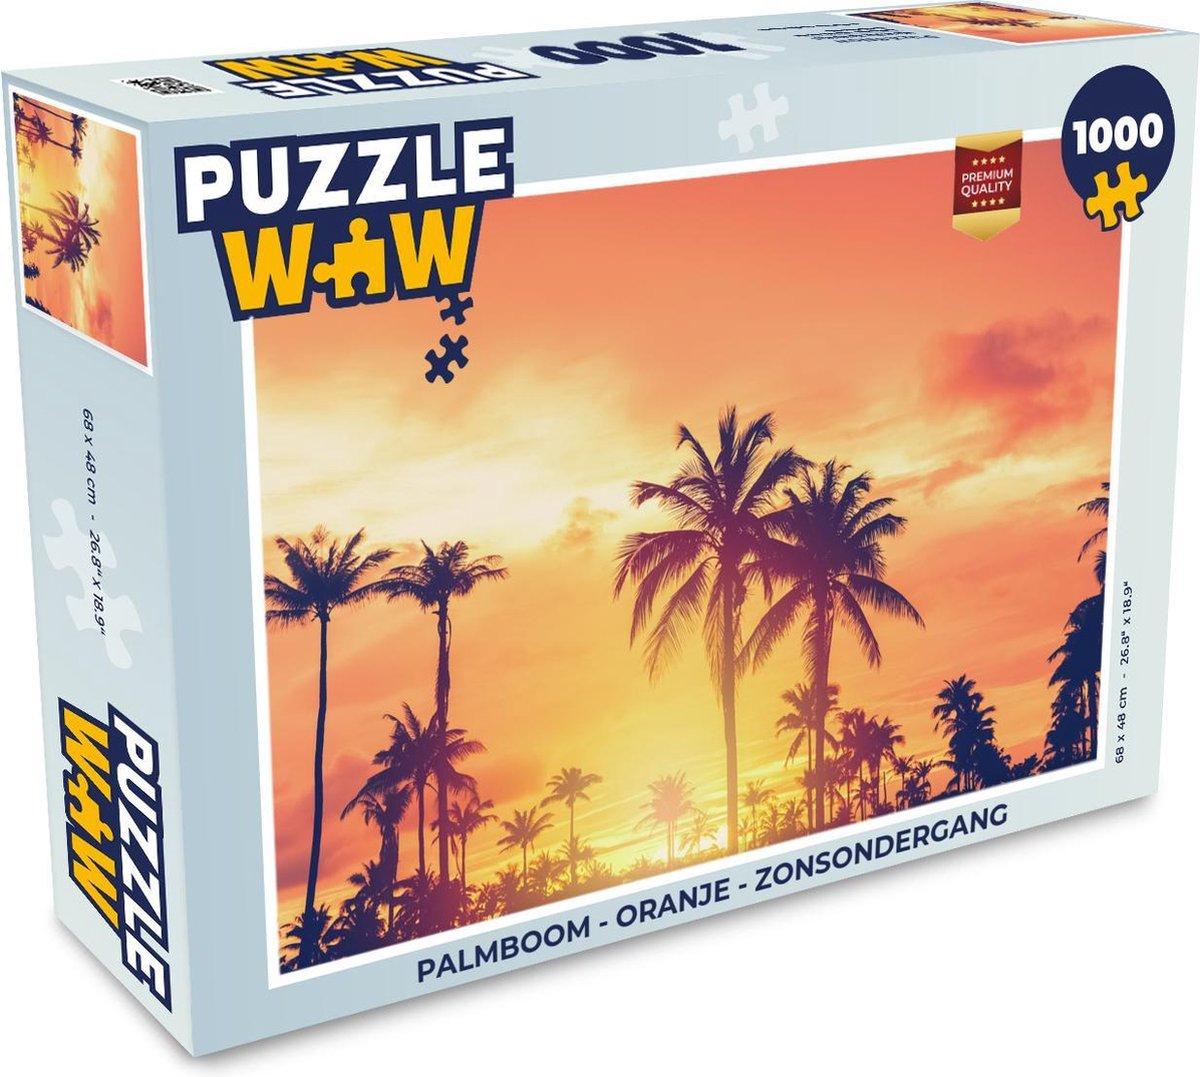 Puzzel Palmboom - Oranje - Zonsondergang - Legpuzzel - Puzzel 1000 stukjes volwassenen